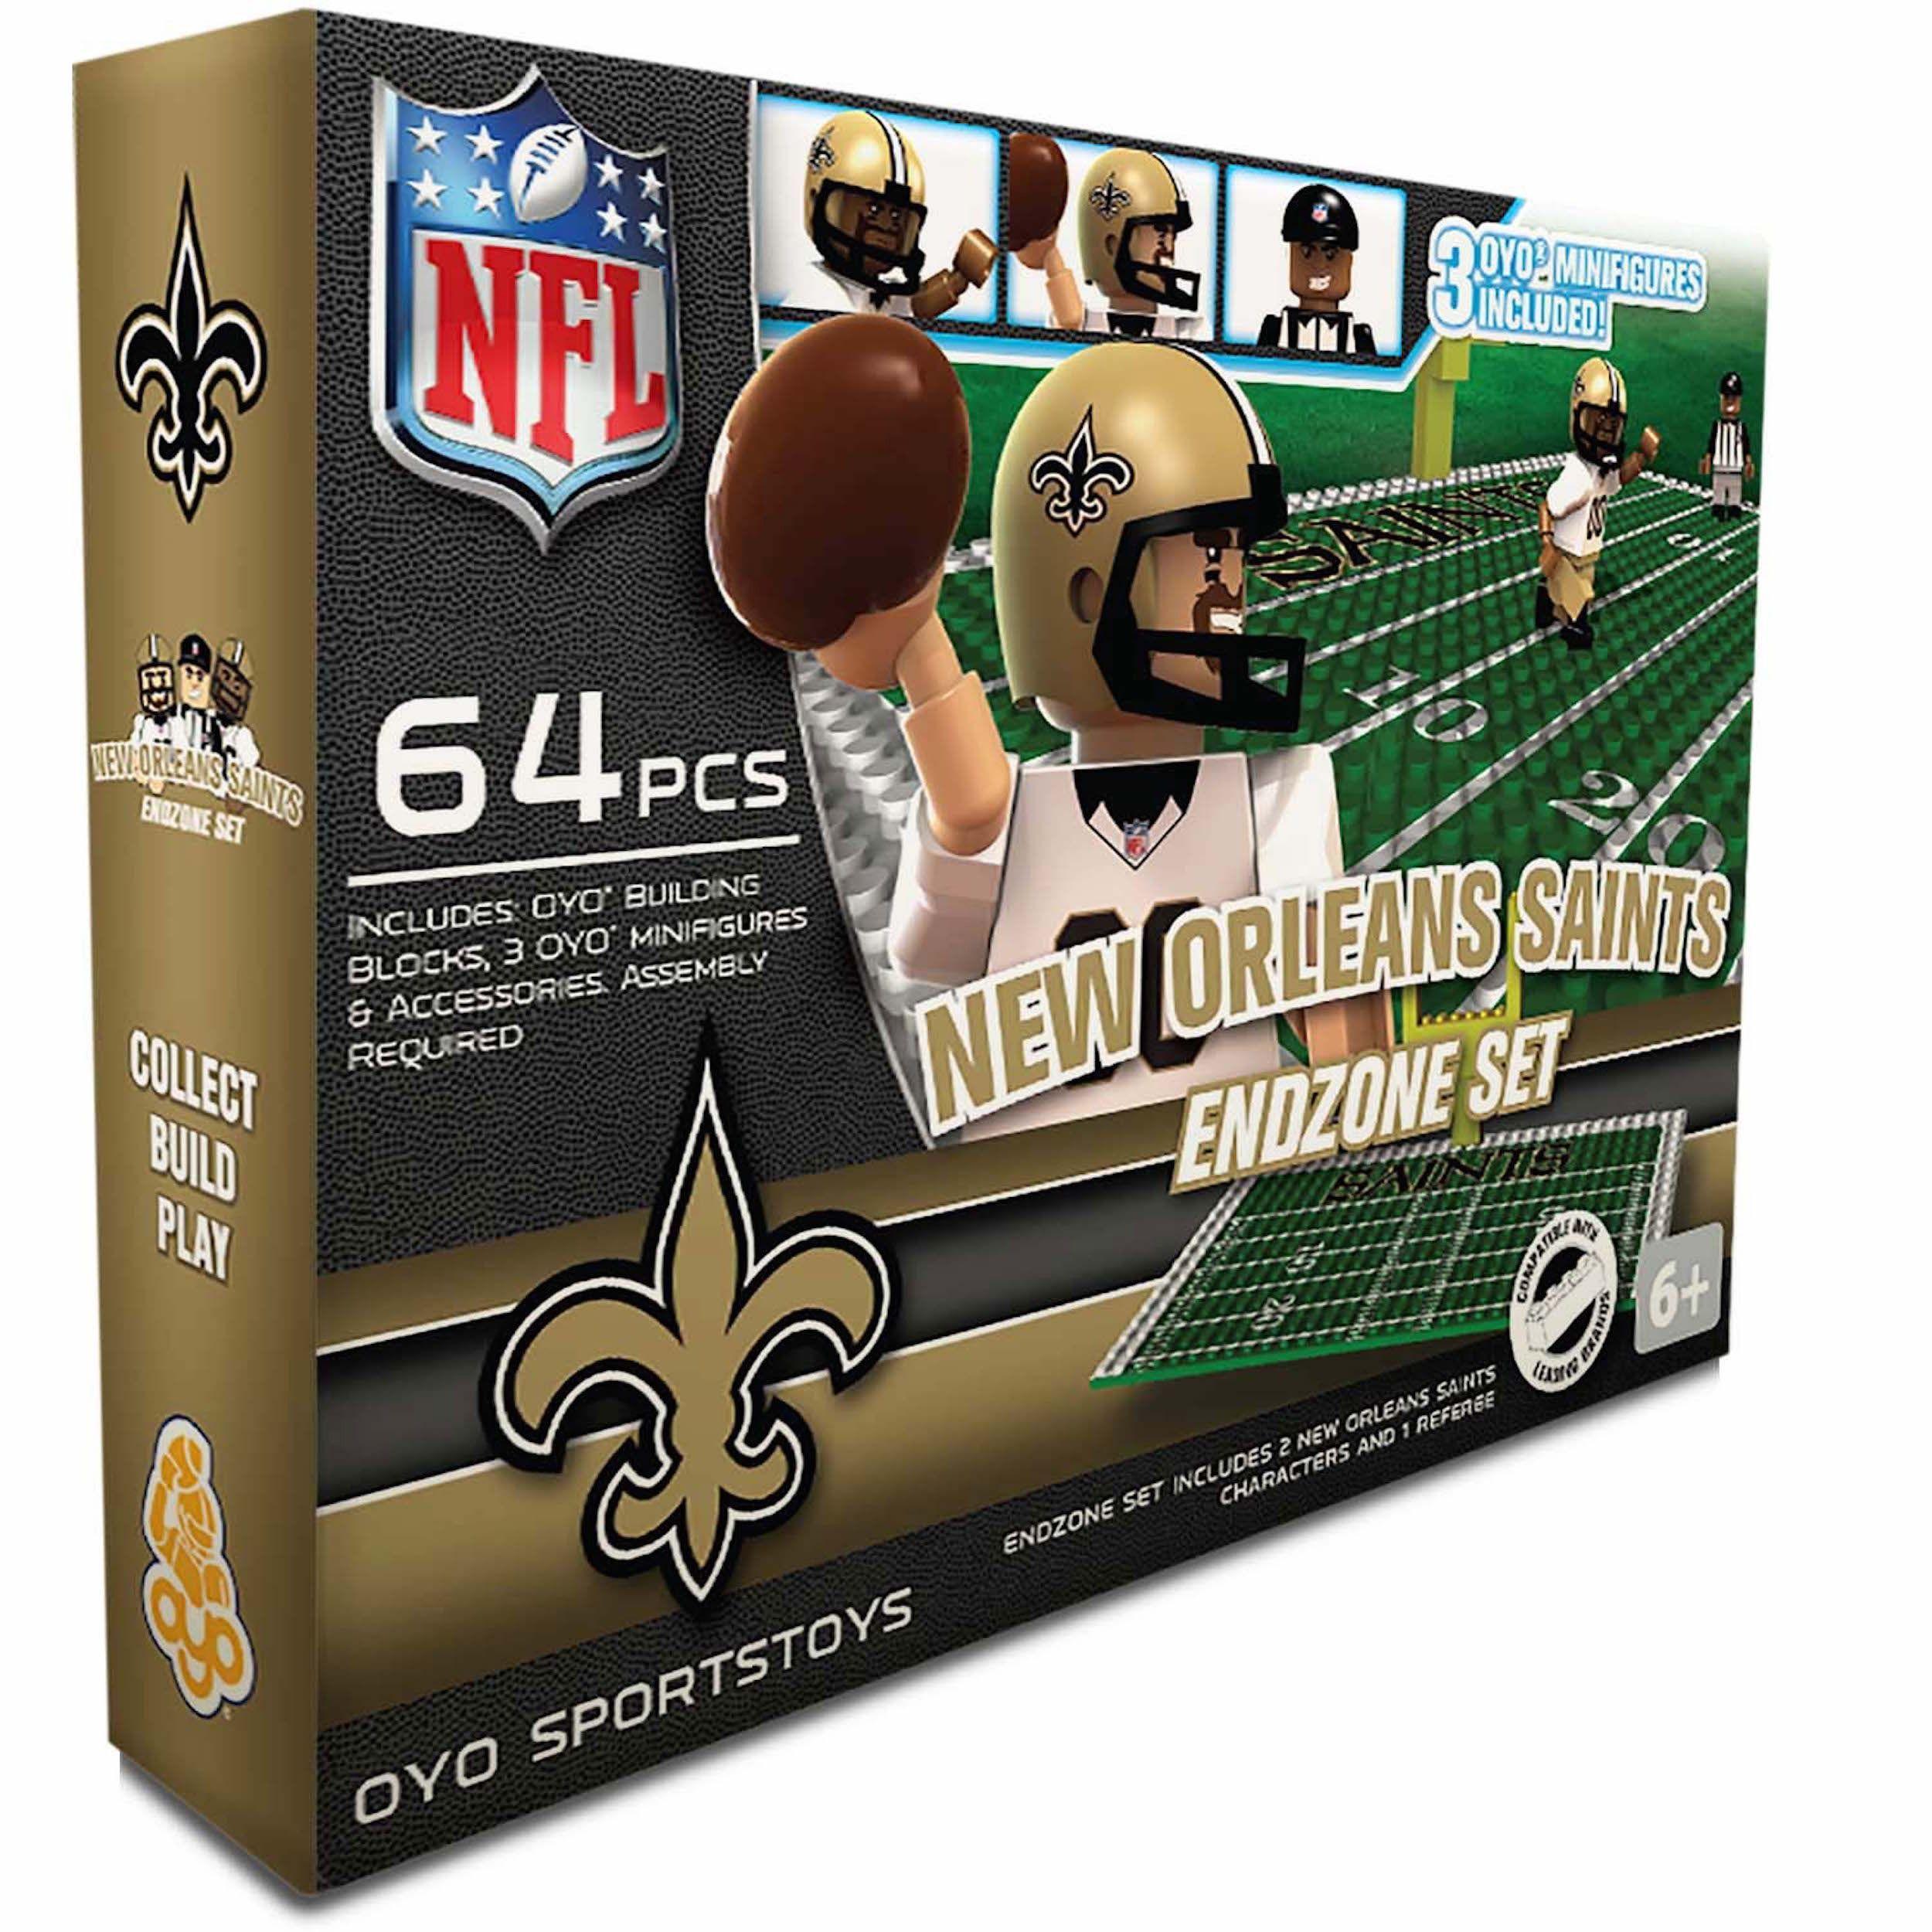 aa5d54d0 Oyo NFL New Orleans Saints 64-Piece End Zone Building Set | Products ...